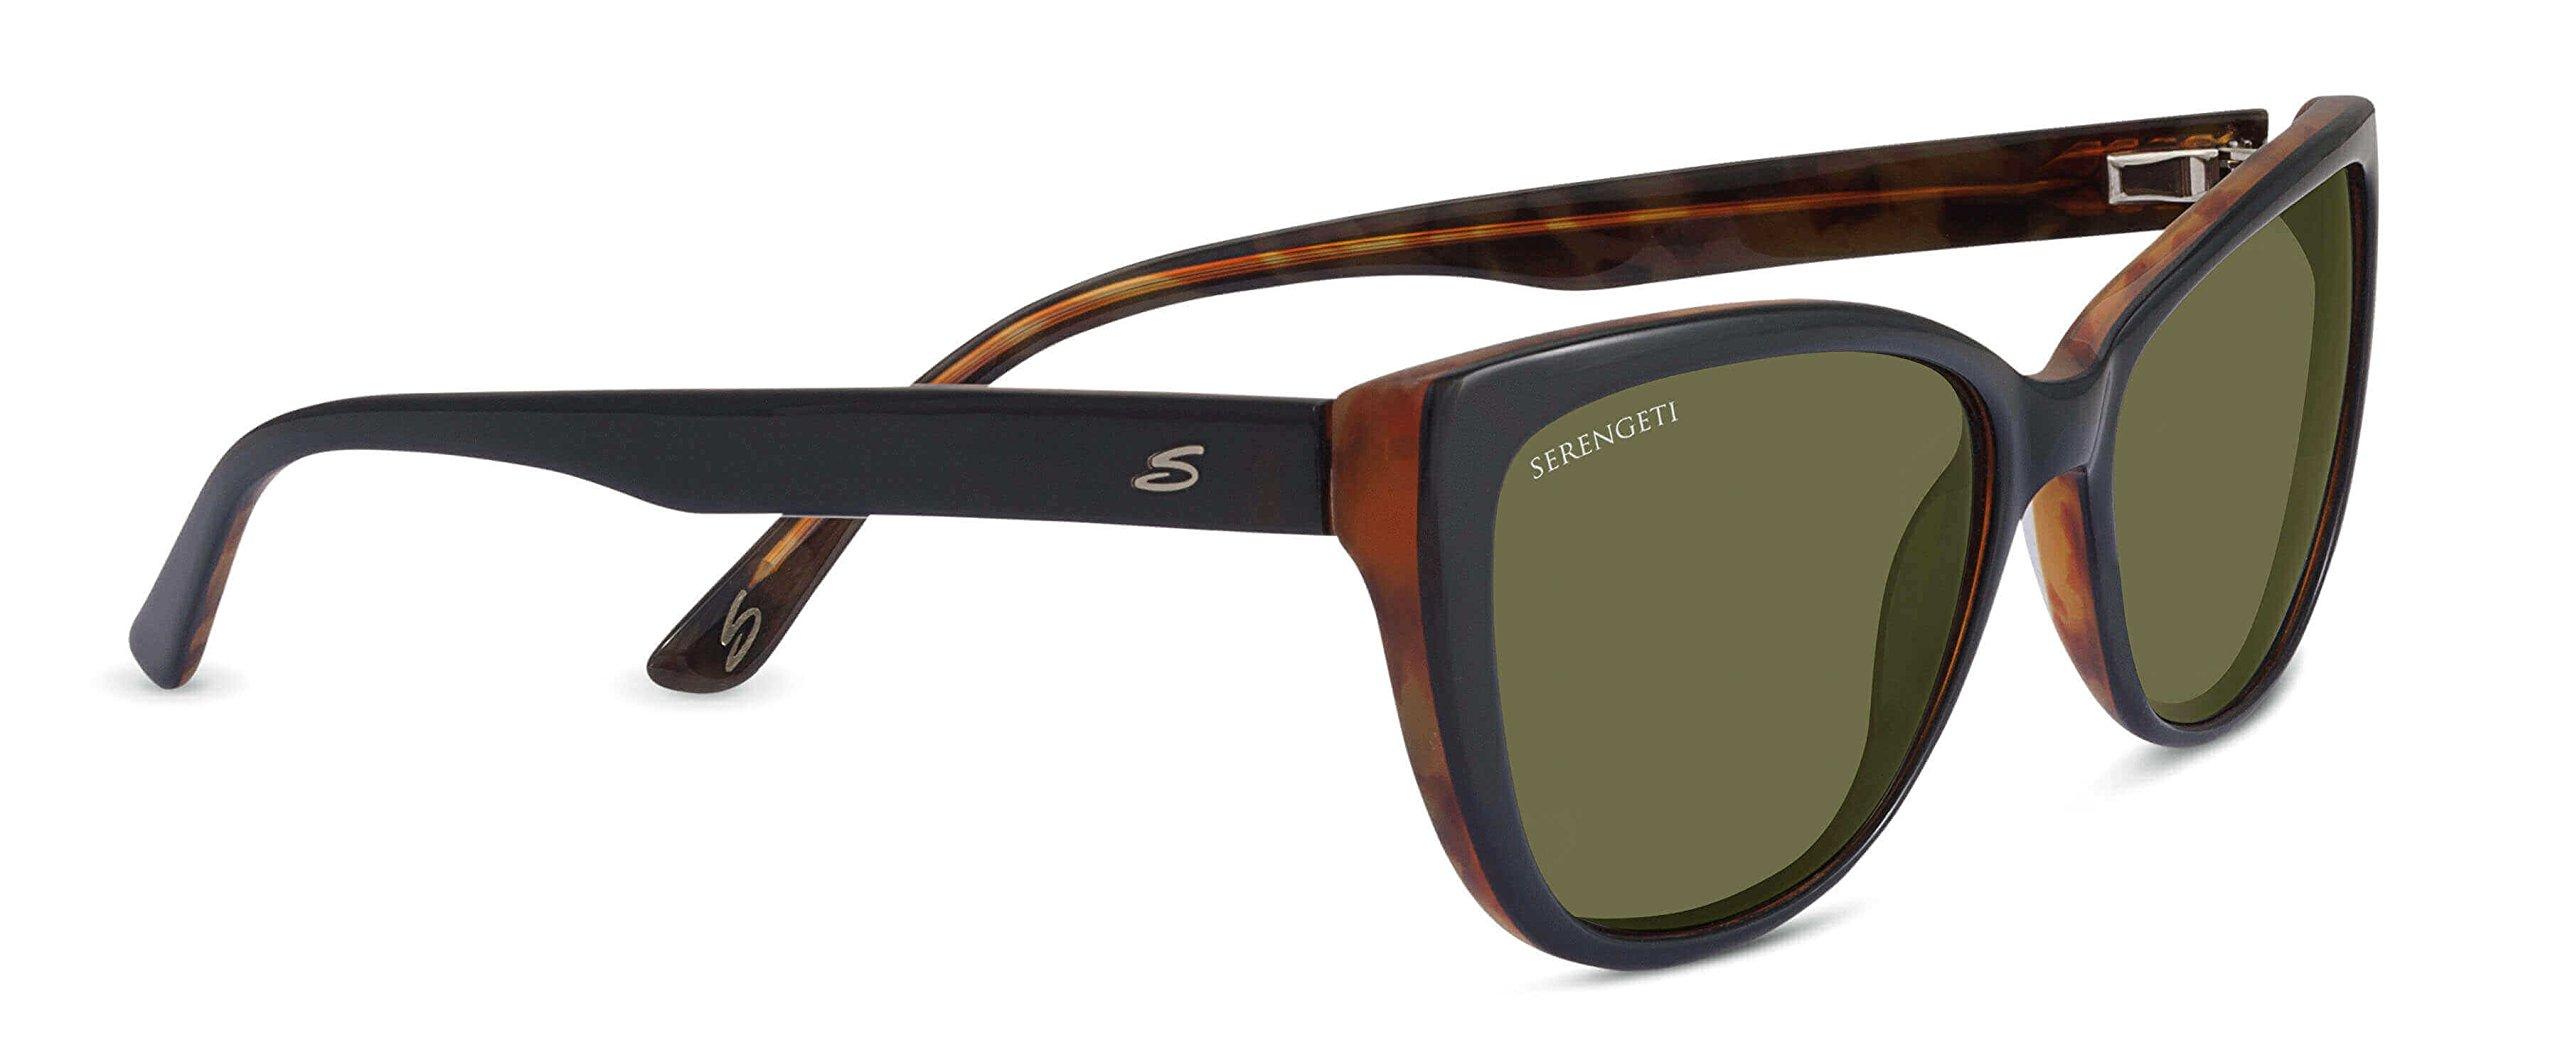 Serengeti 7890 Sophia, Shiny Black/Tortoise Frame, Polarized 555nm Lens